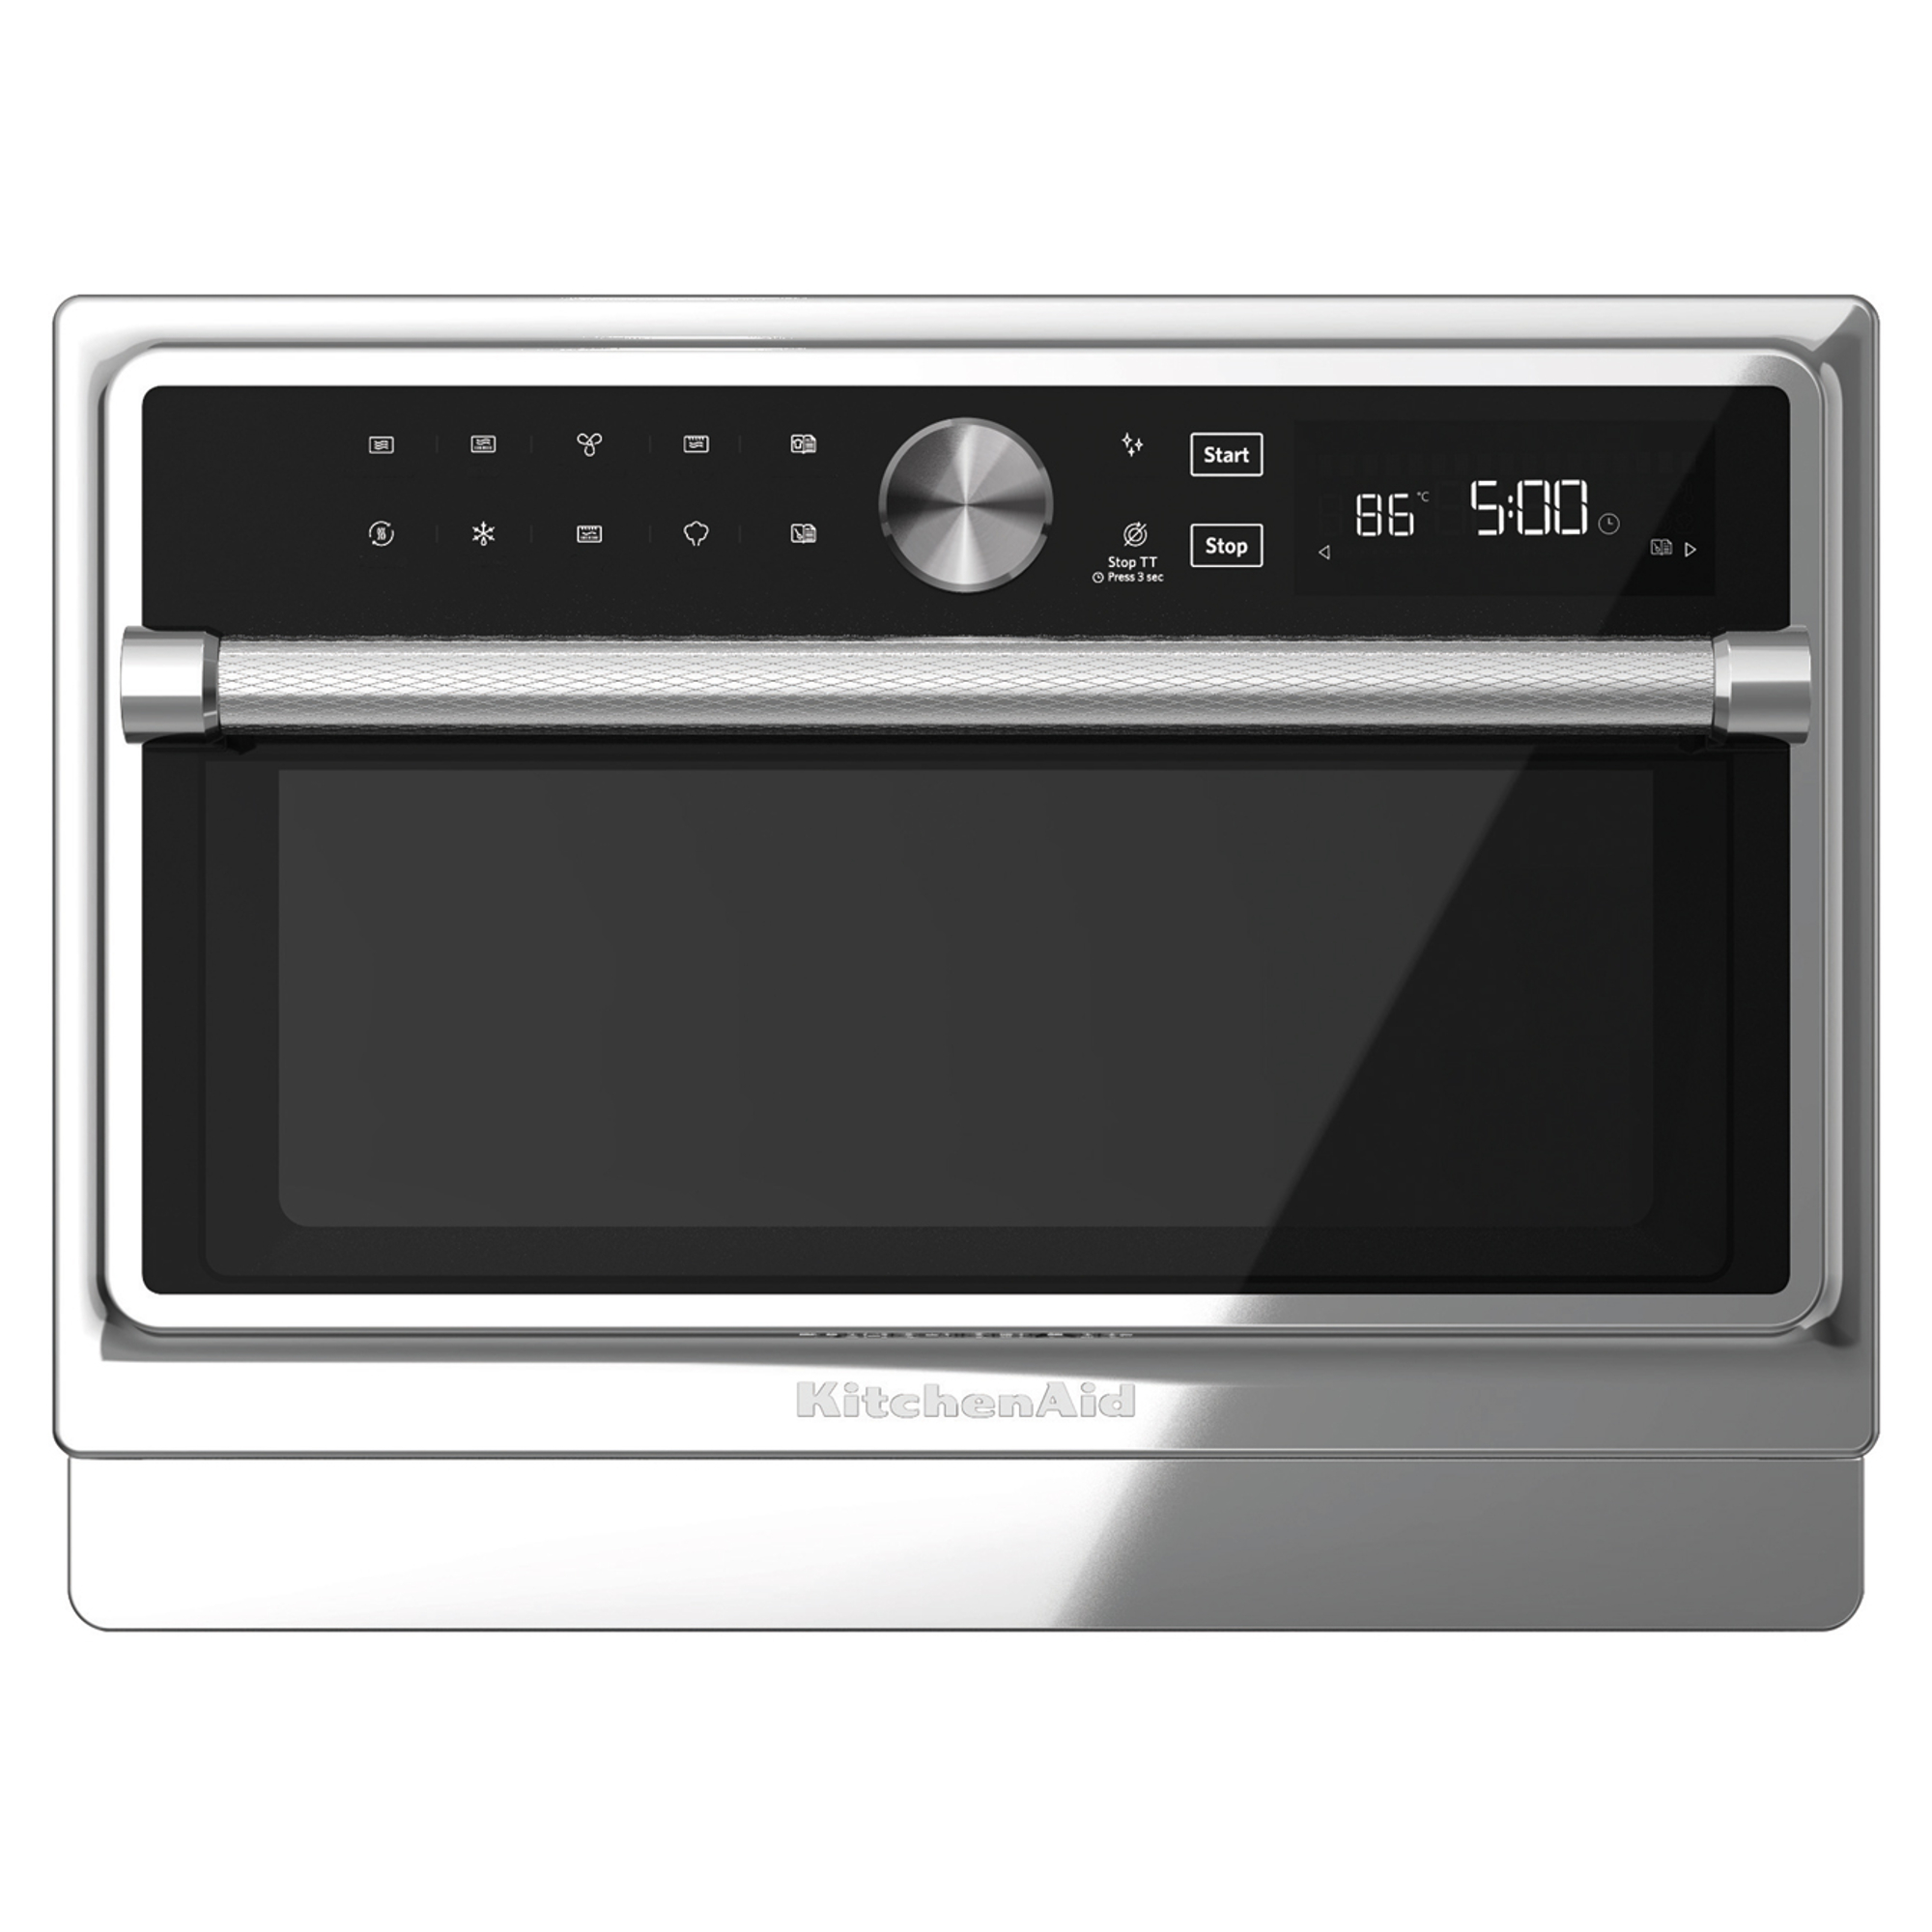 kmqfx33910 33l combination microwave oven